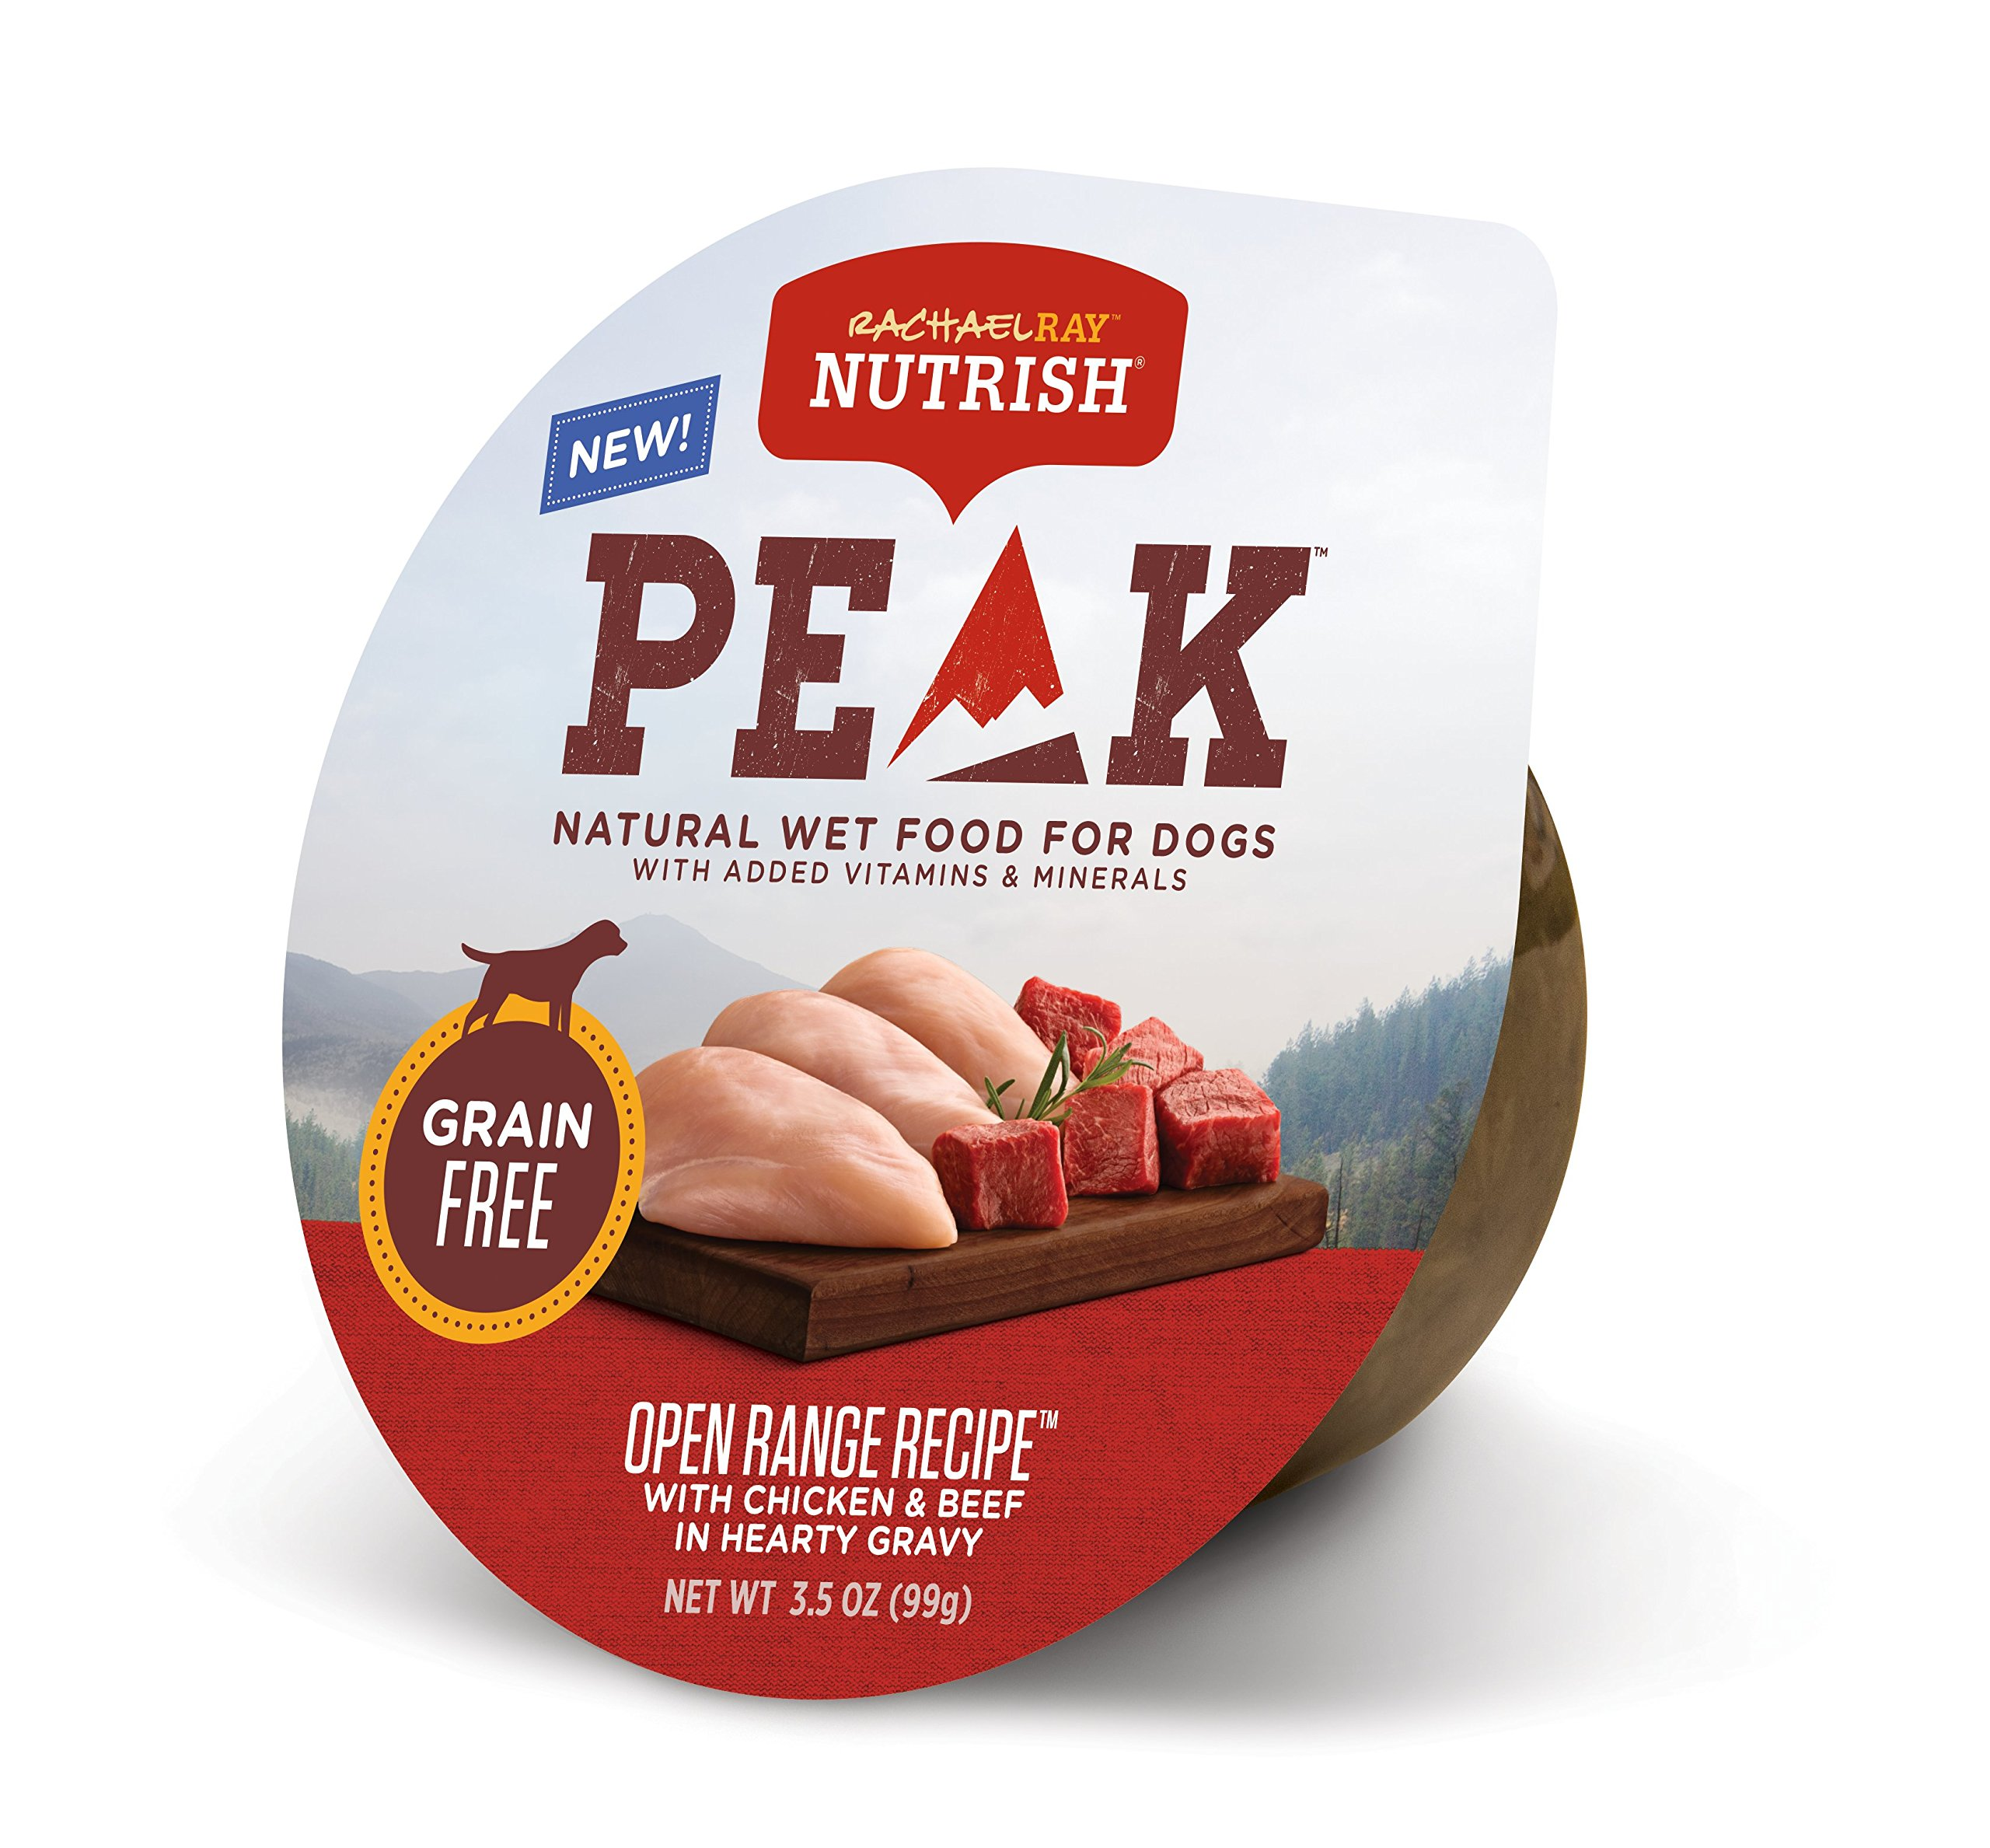 Rachael Ray Nutrish Peak Natural Wet Dog Food, Grain Free Open Range Recipe Chicken & Beef in Hearty Gravy, 3.5 oz. tub (Pack of 16)